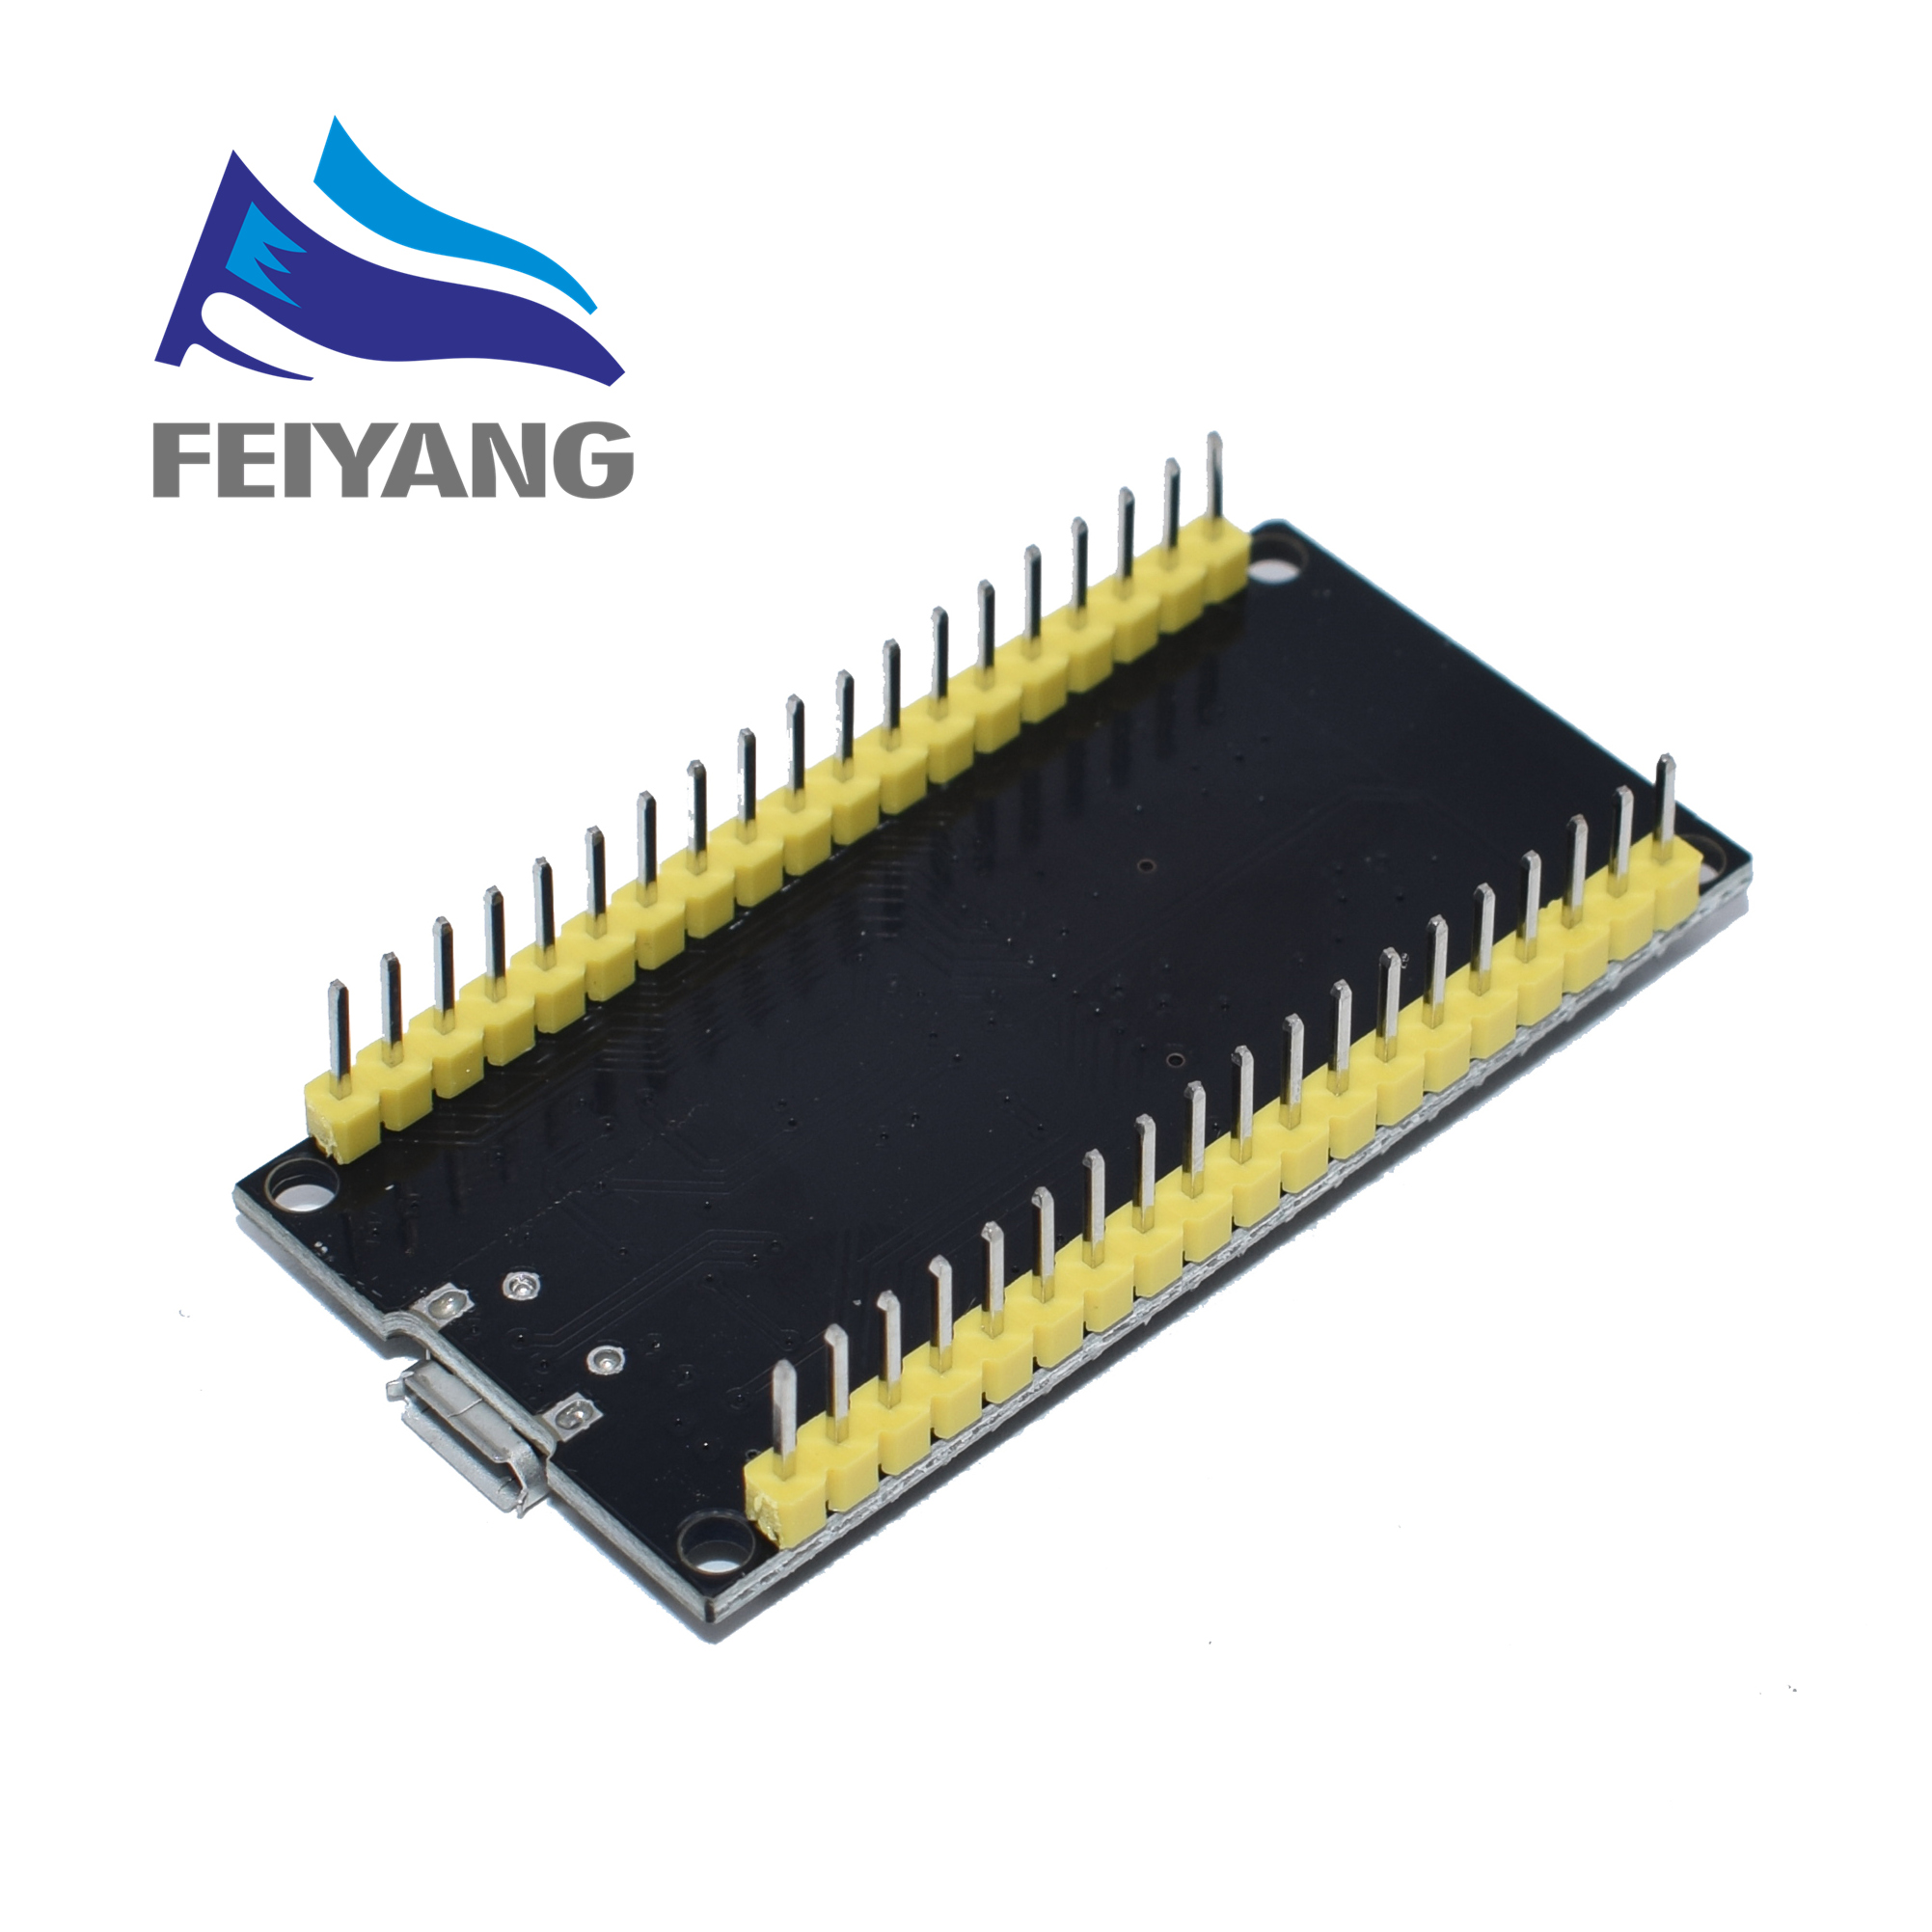 Leistungsverstärker Mini Verstärkerplatine LM386 3V-12V New Ic ce